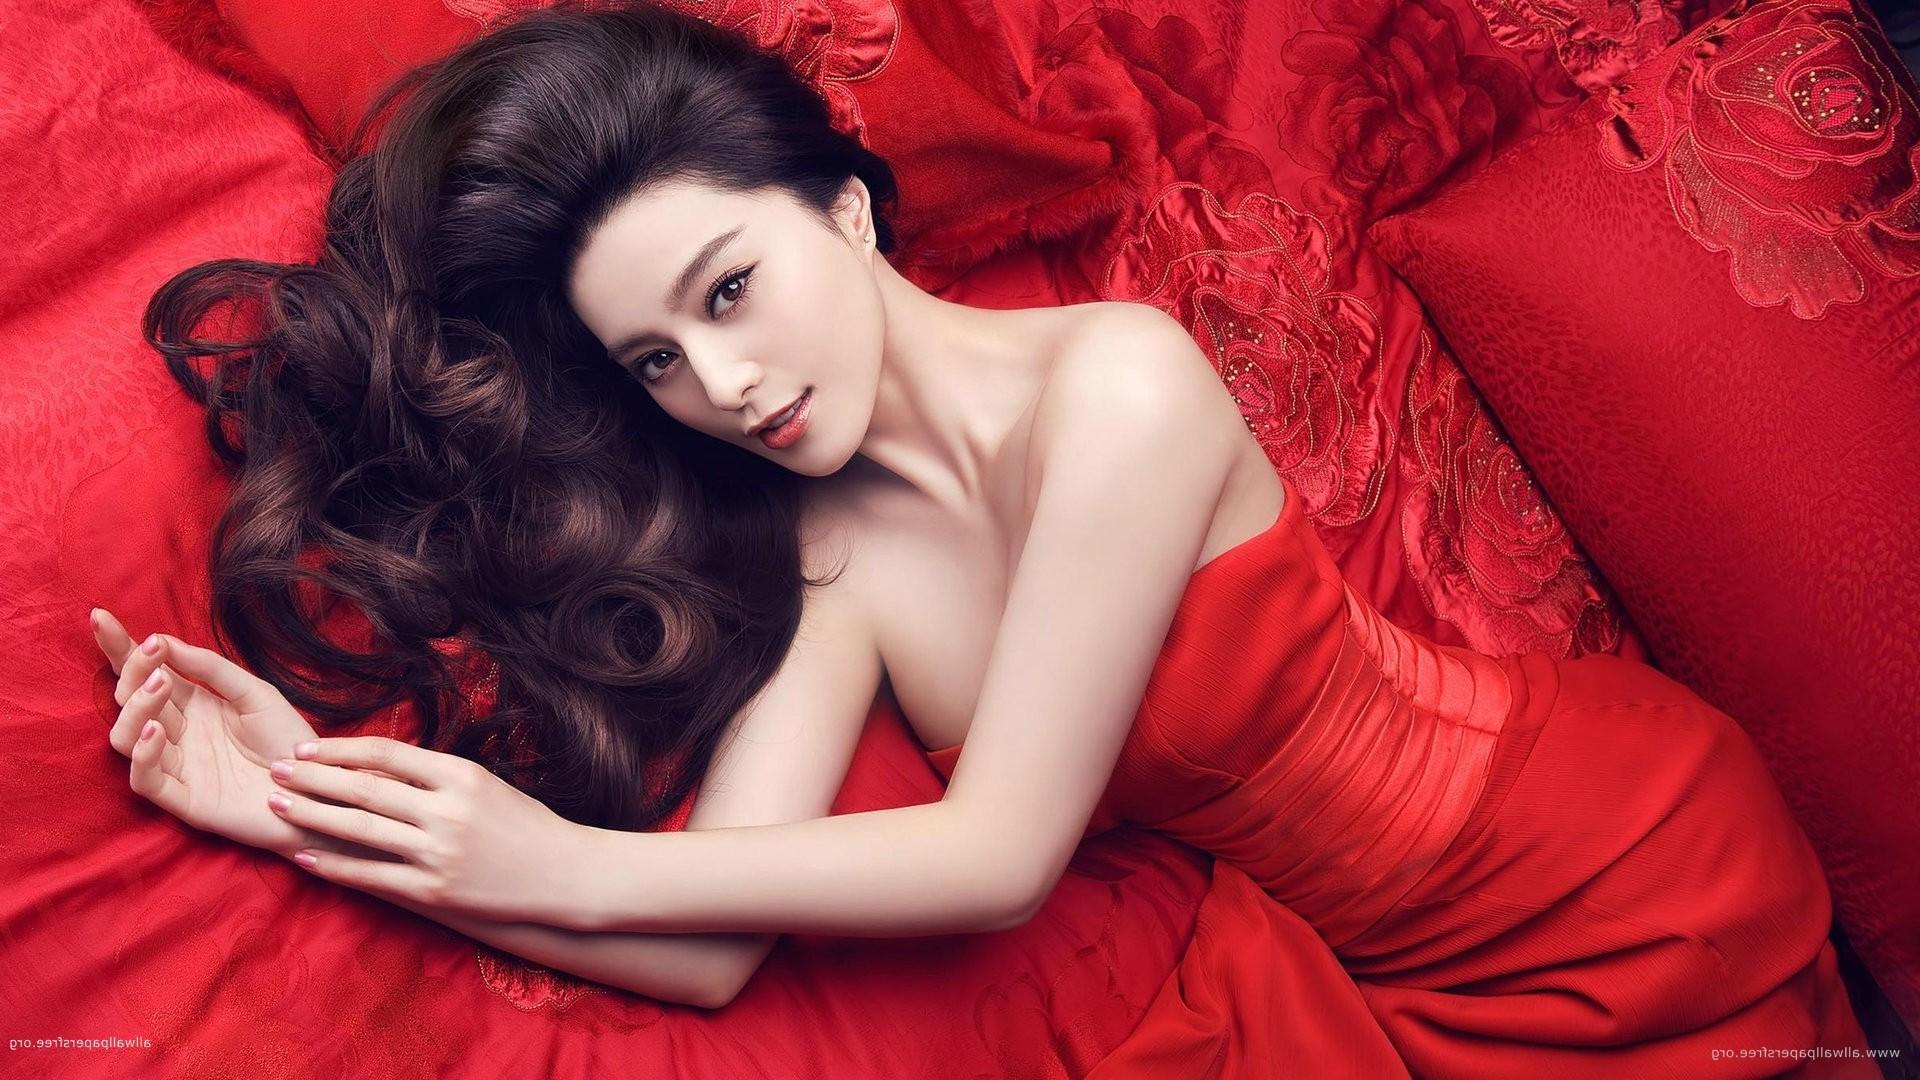 wallpaper : women, model, long hair, asian, red dress, fashion